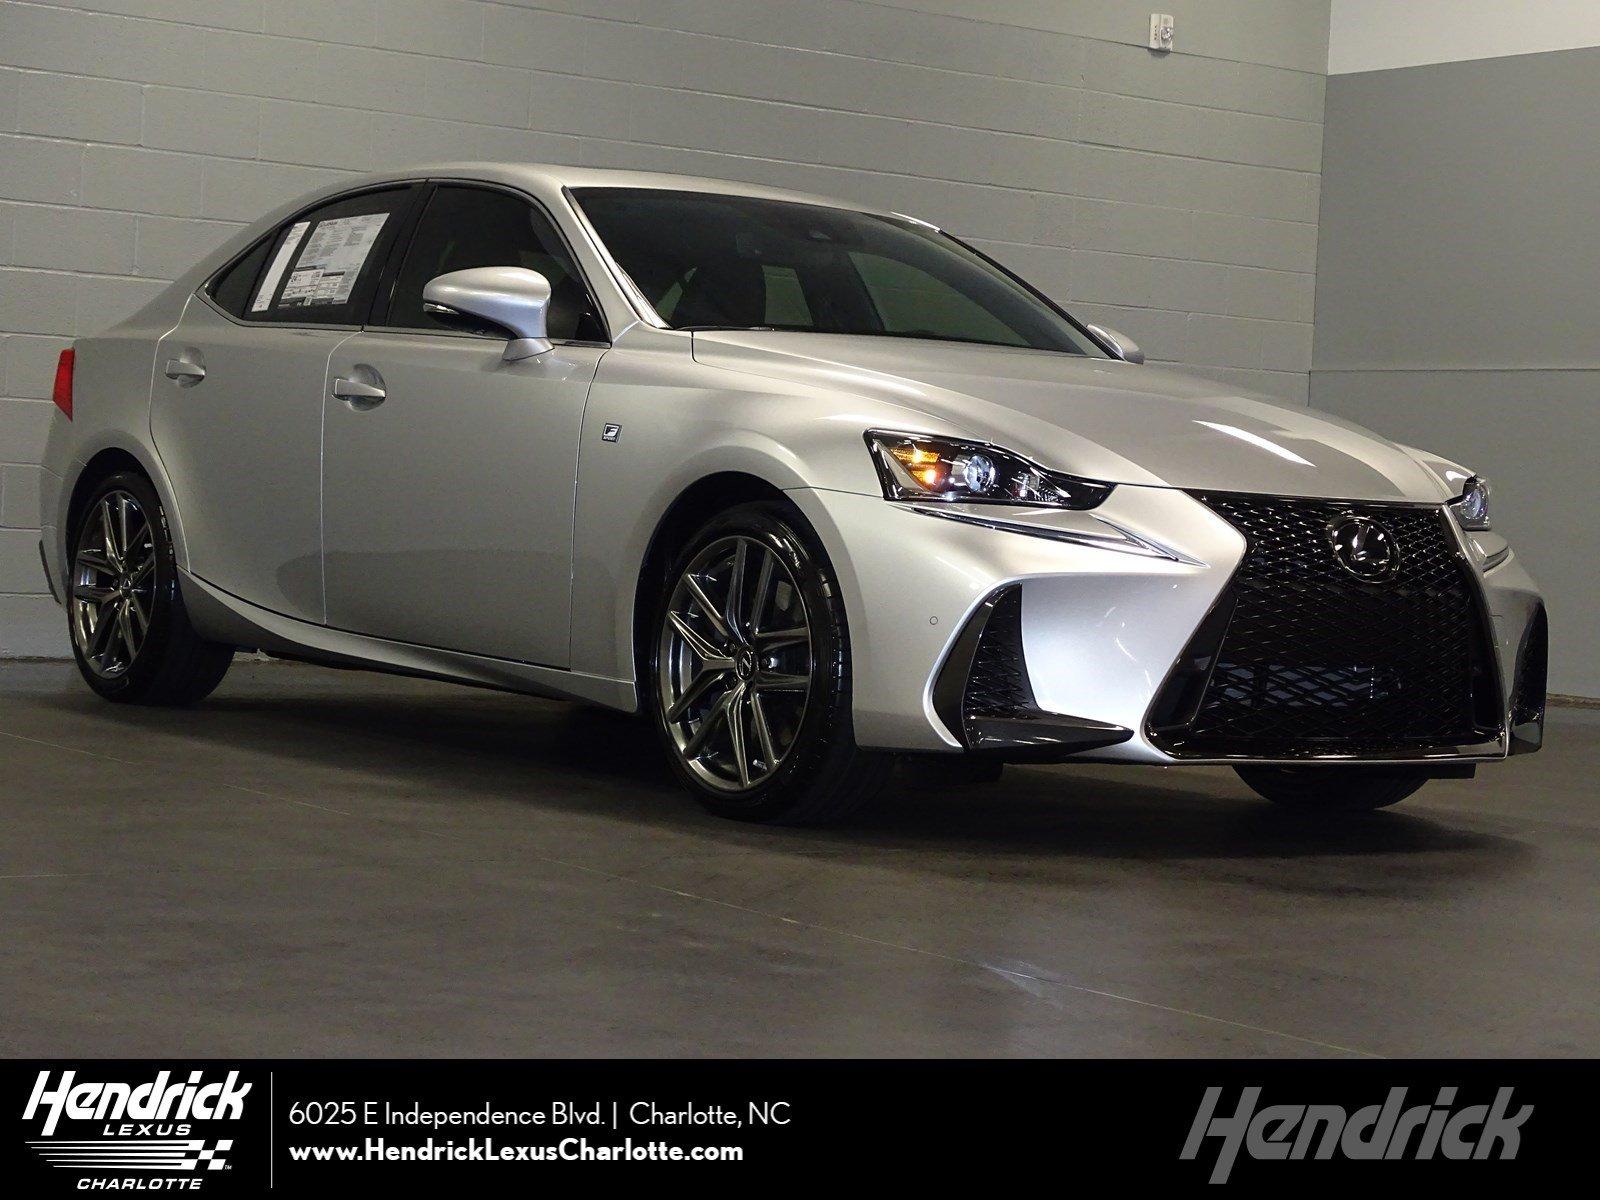 New 2019 LEXUS IS 300 For Sale in Charlotte | Hendrick Lexus